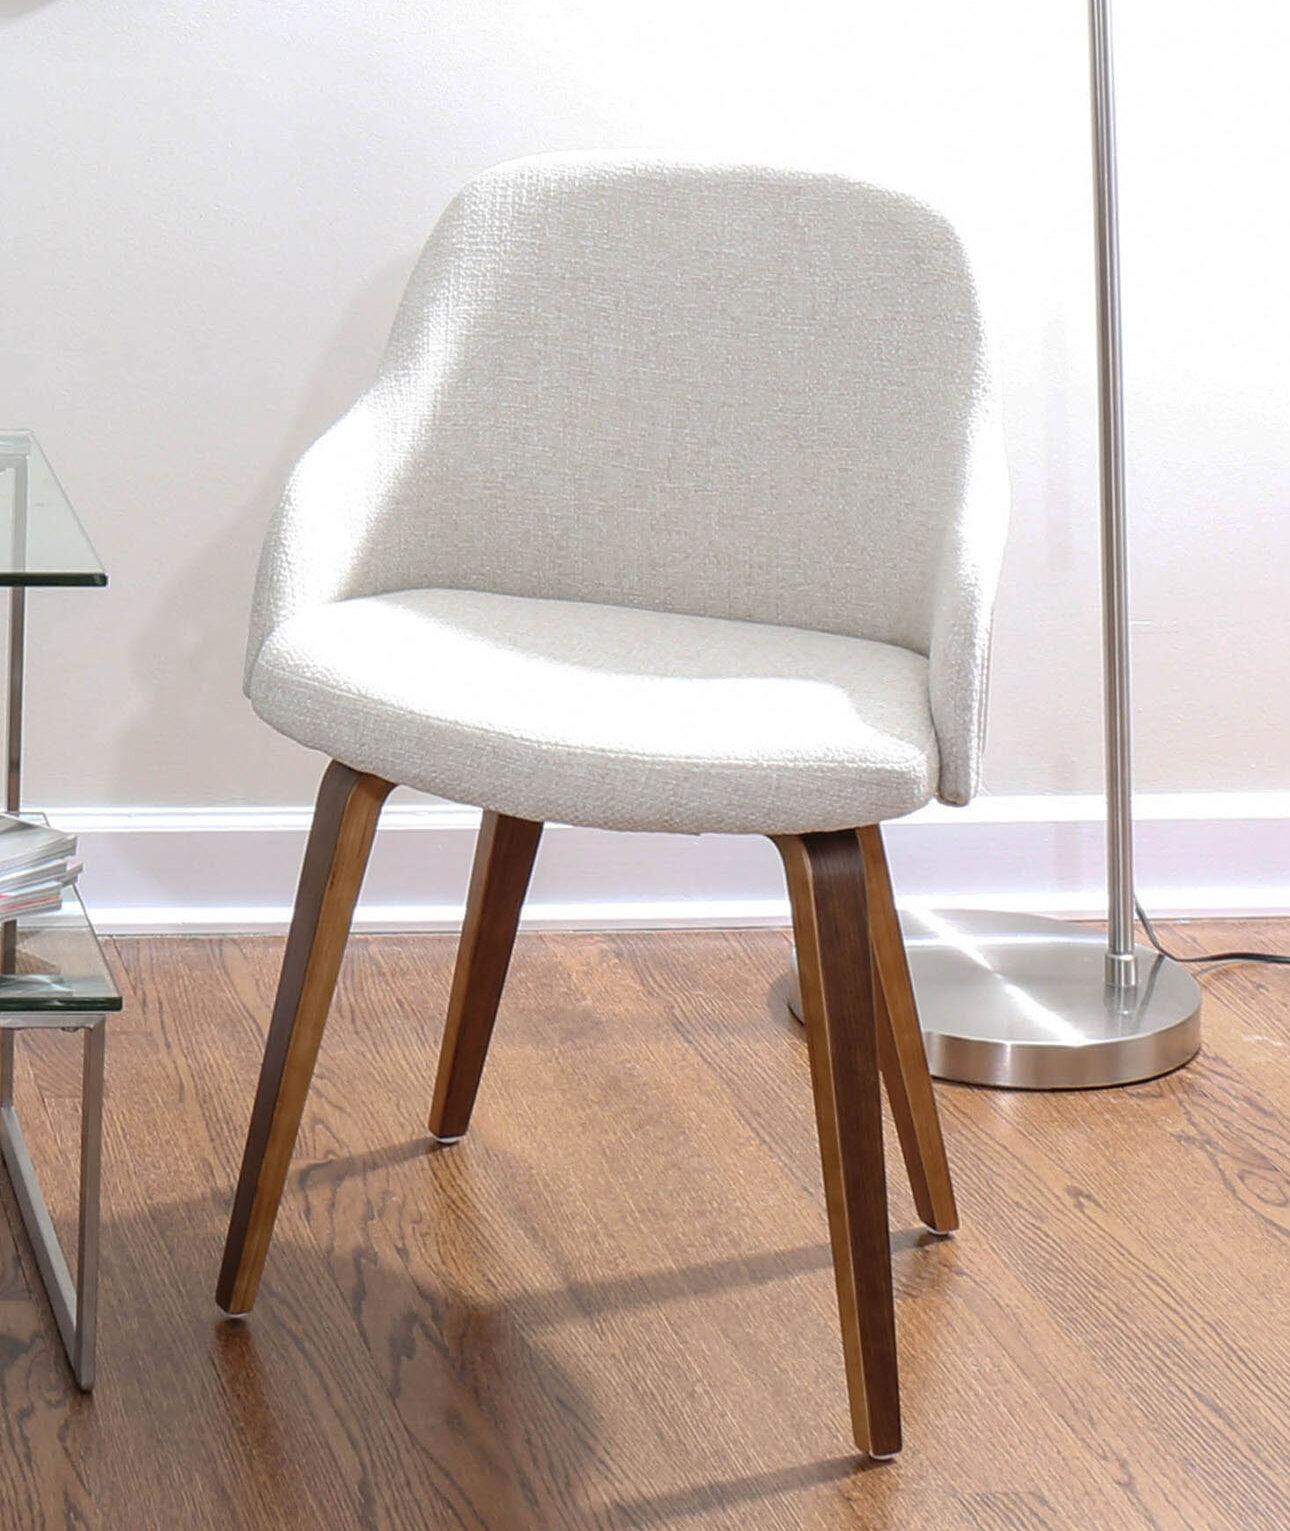 Astonishing Midcentury Dining Chair Wayfair Download Free Architecture Designs Viewormadebymaigaardcom